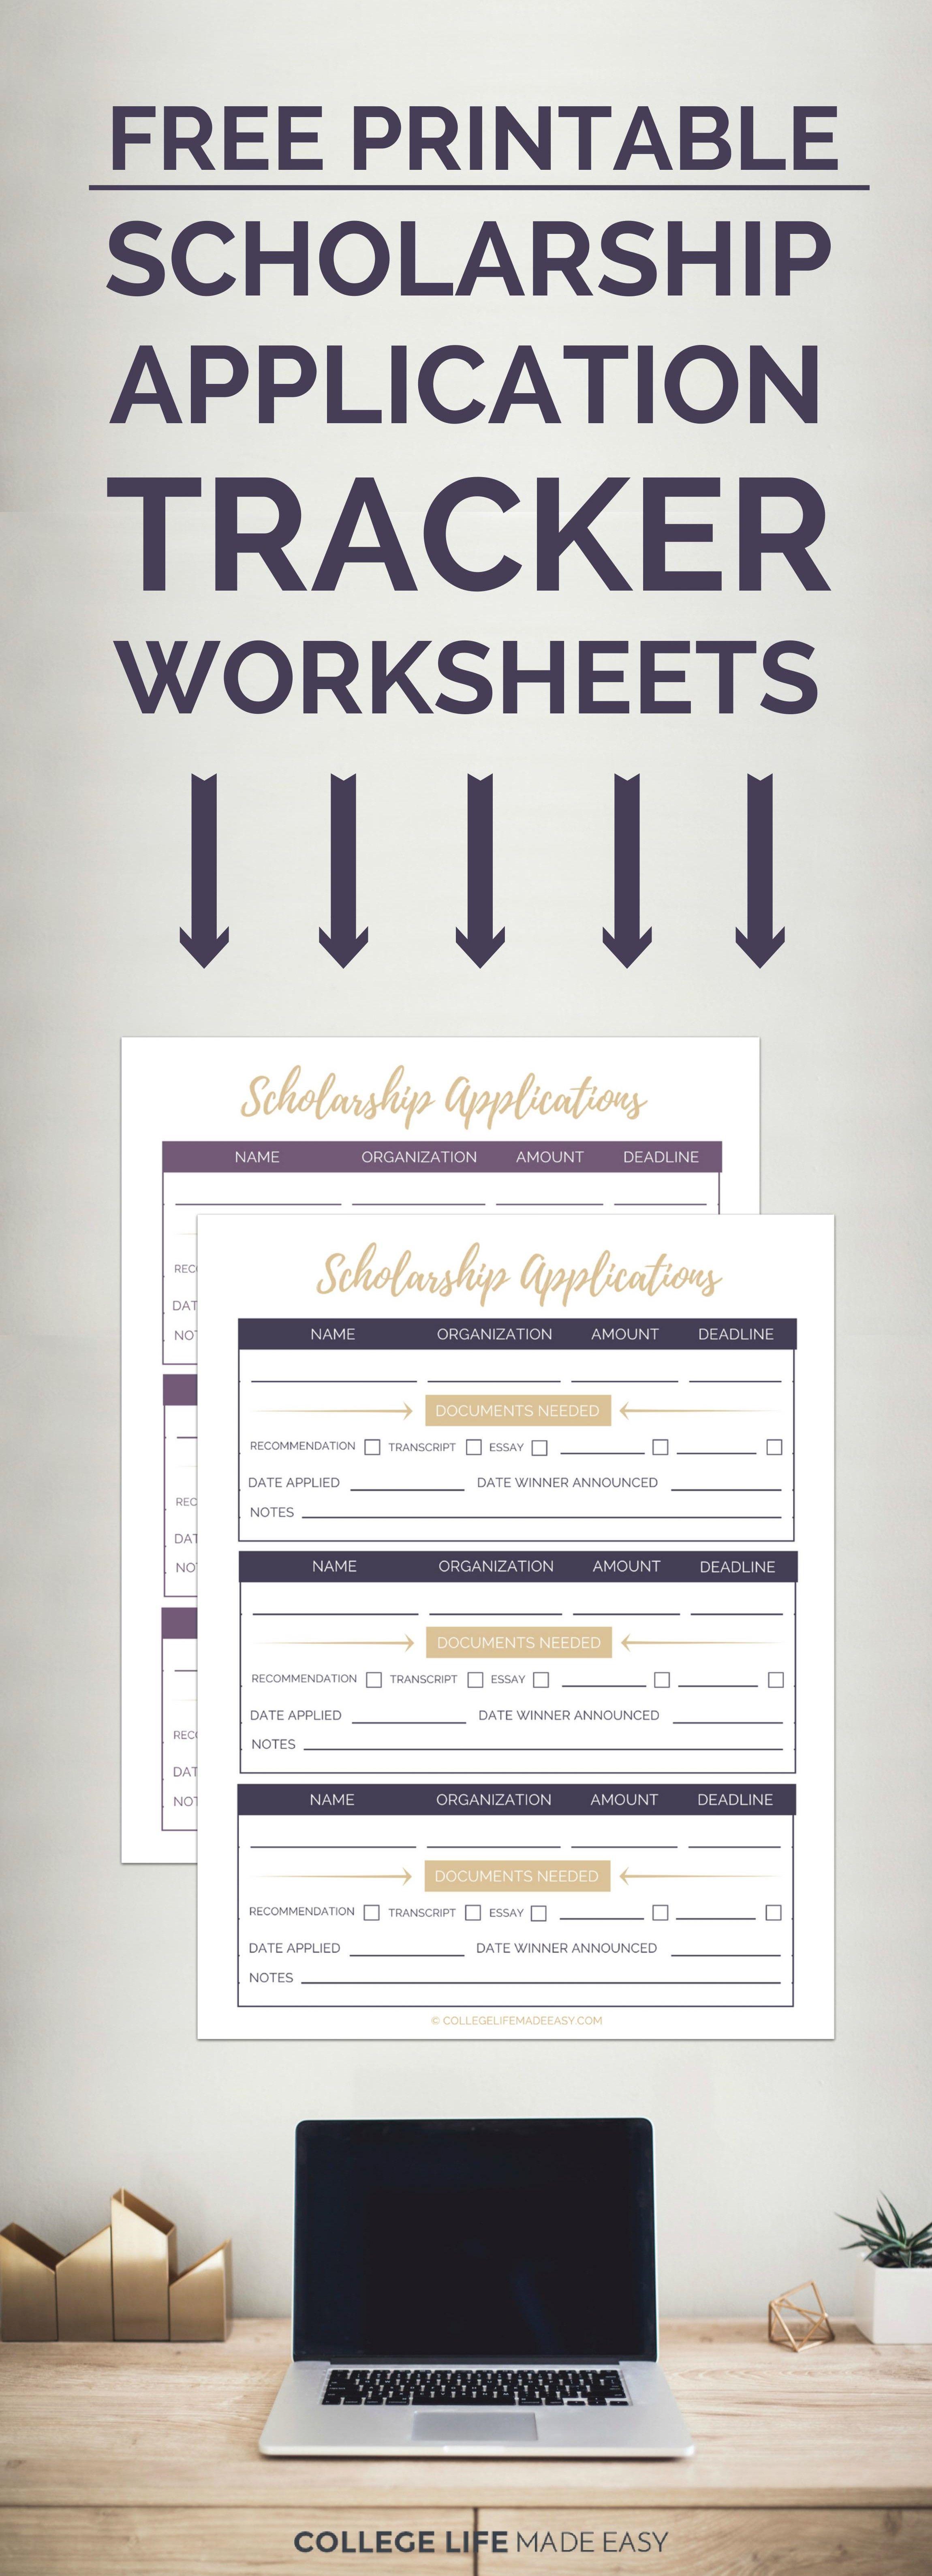 Free Printable Scholarship Application Tracker Worksheets